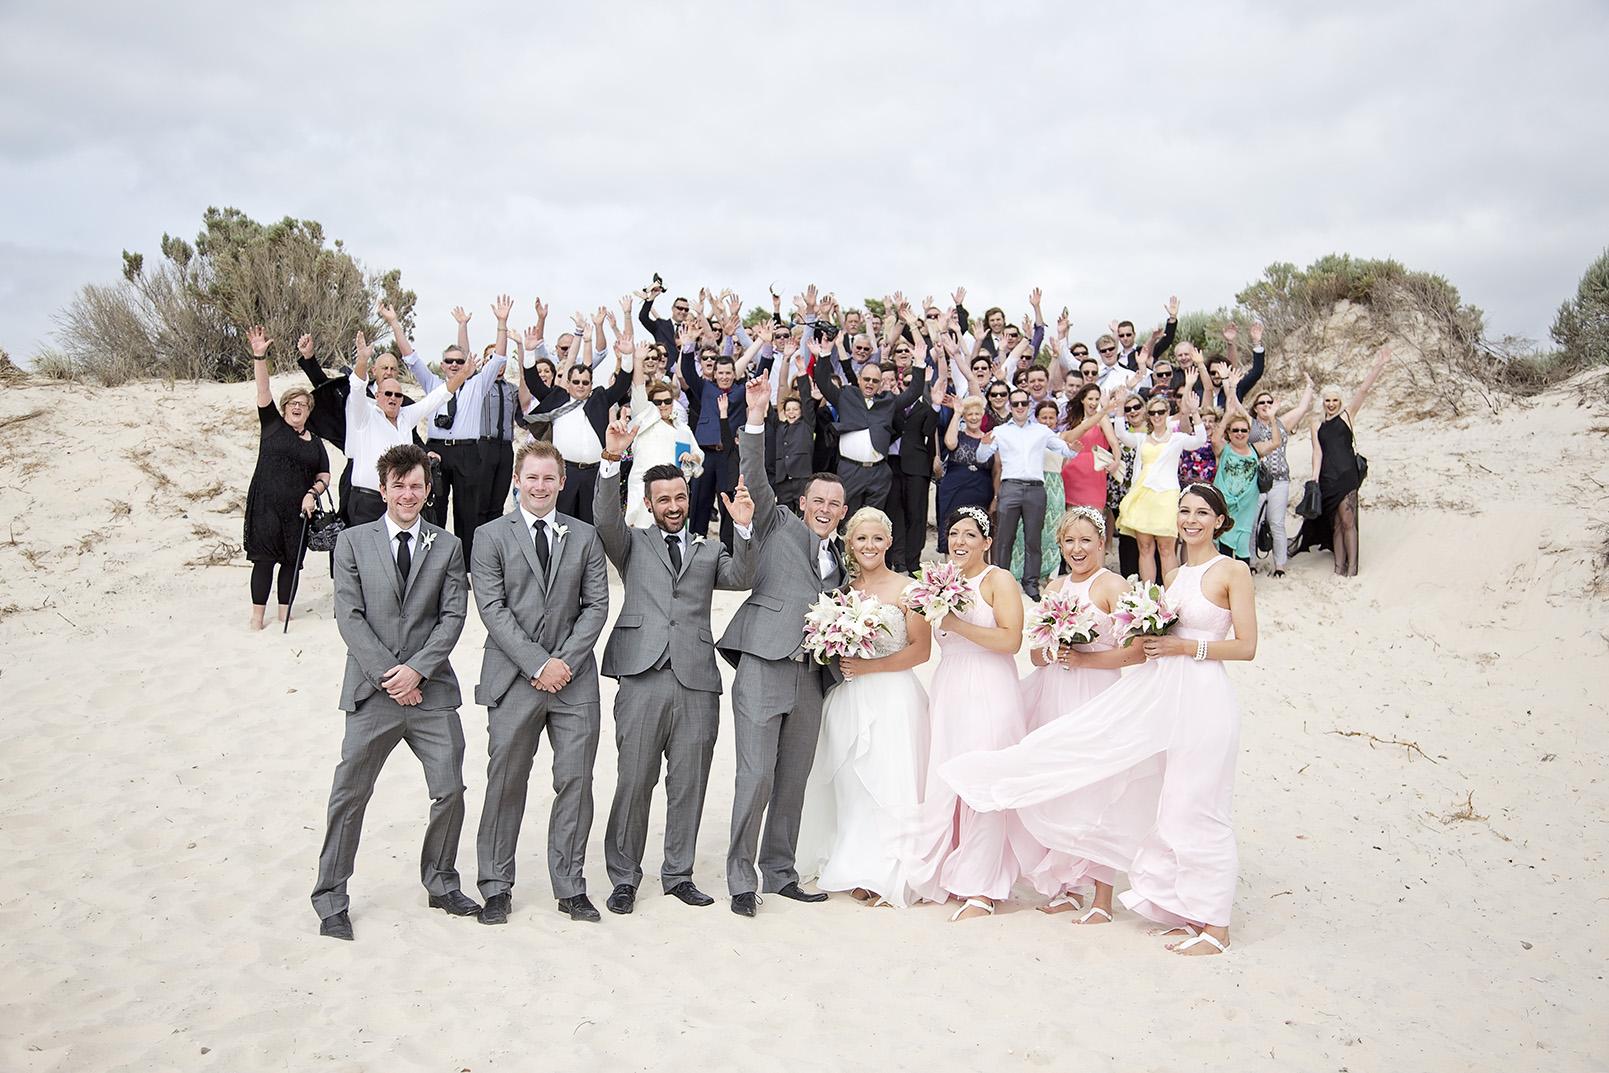 Adelaide Beach Wedding West Beach 07 Group Photo.jpg